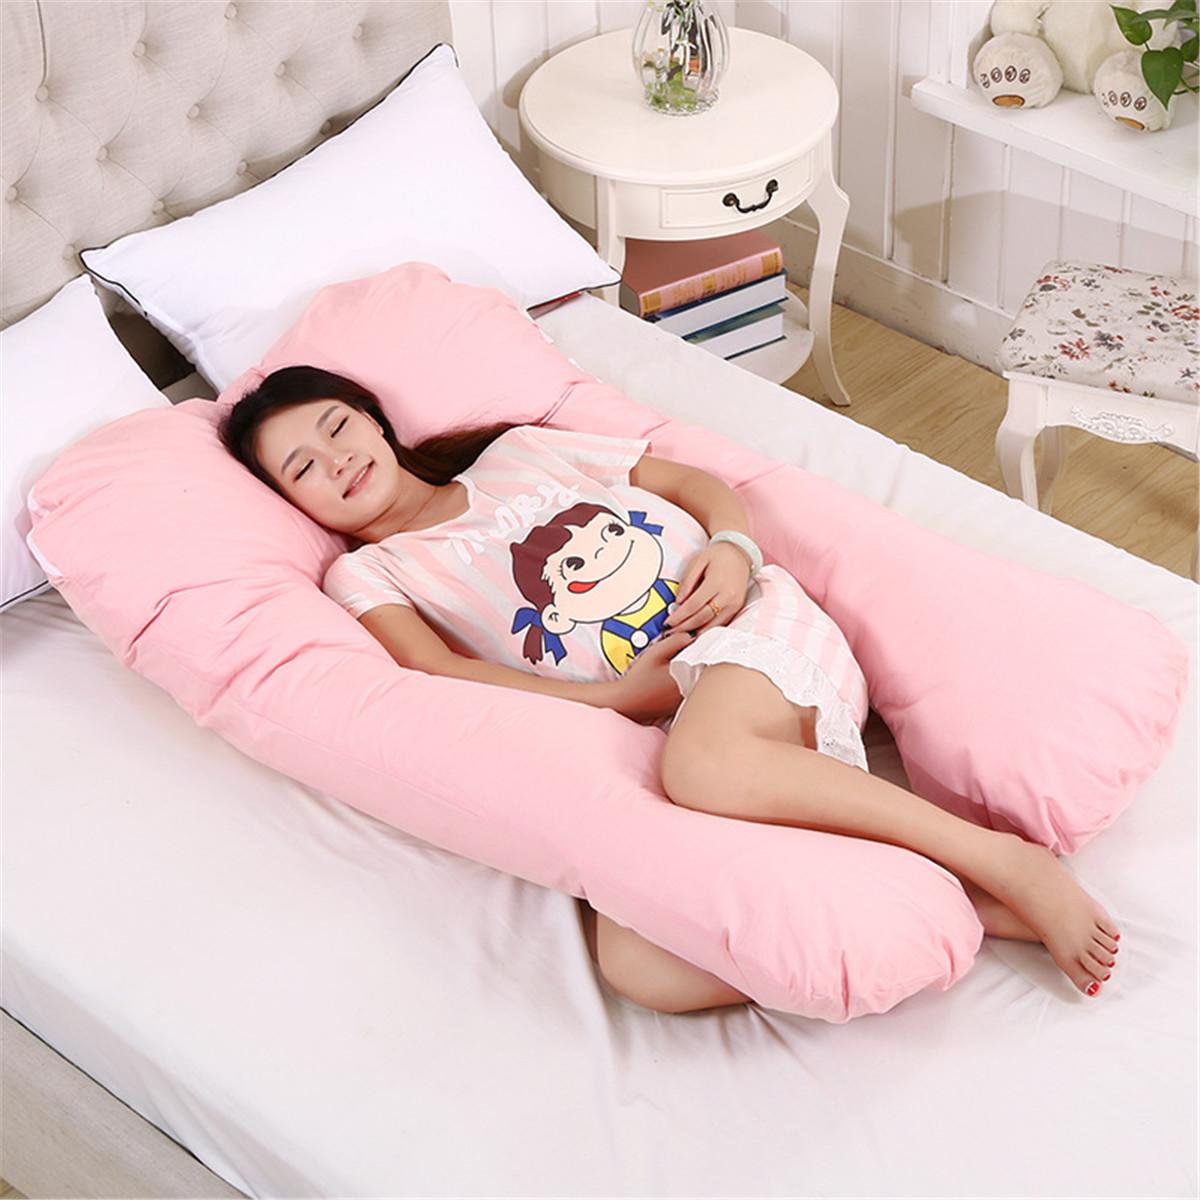 Family Maternity Pillow Pregnancy Nursing Sleeping Support